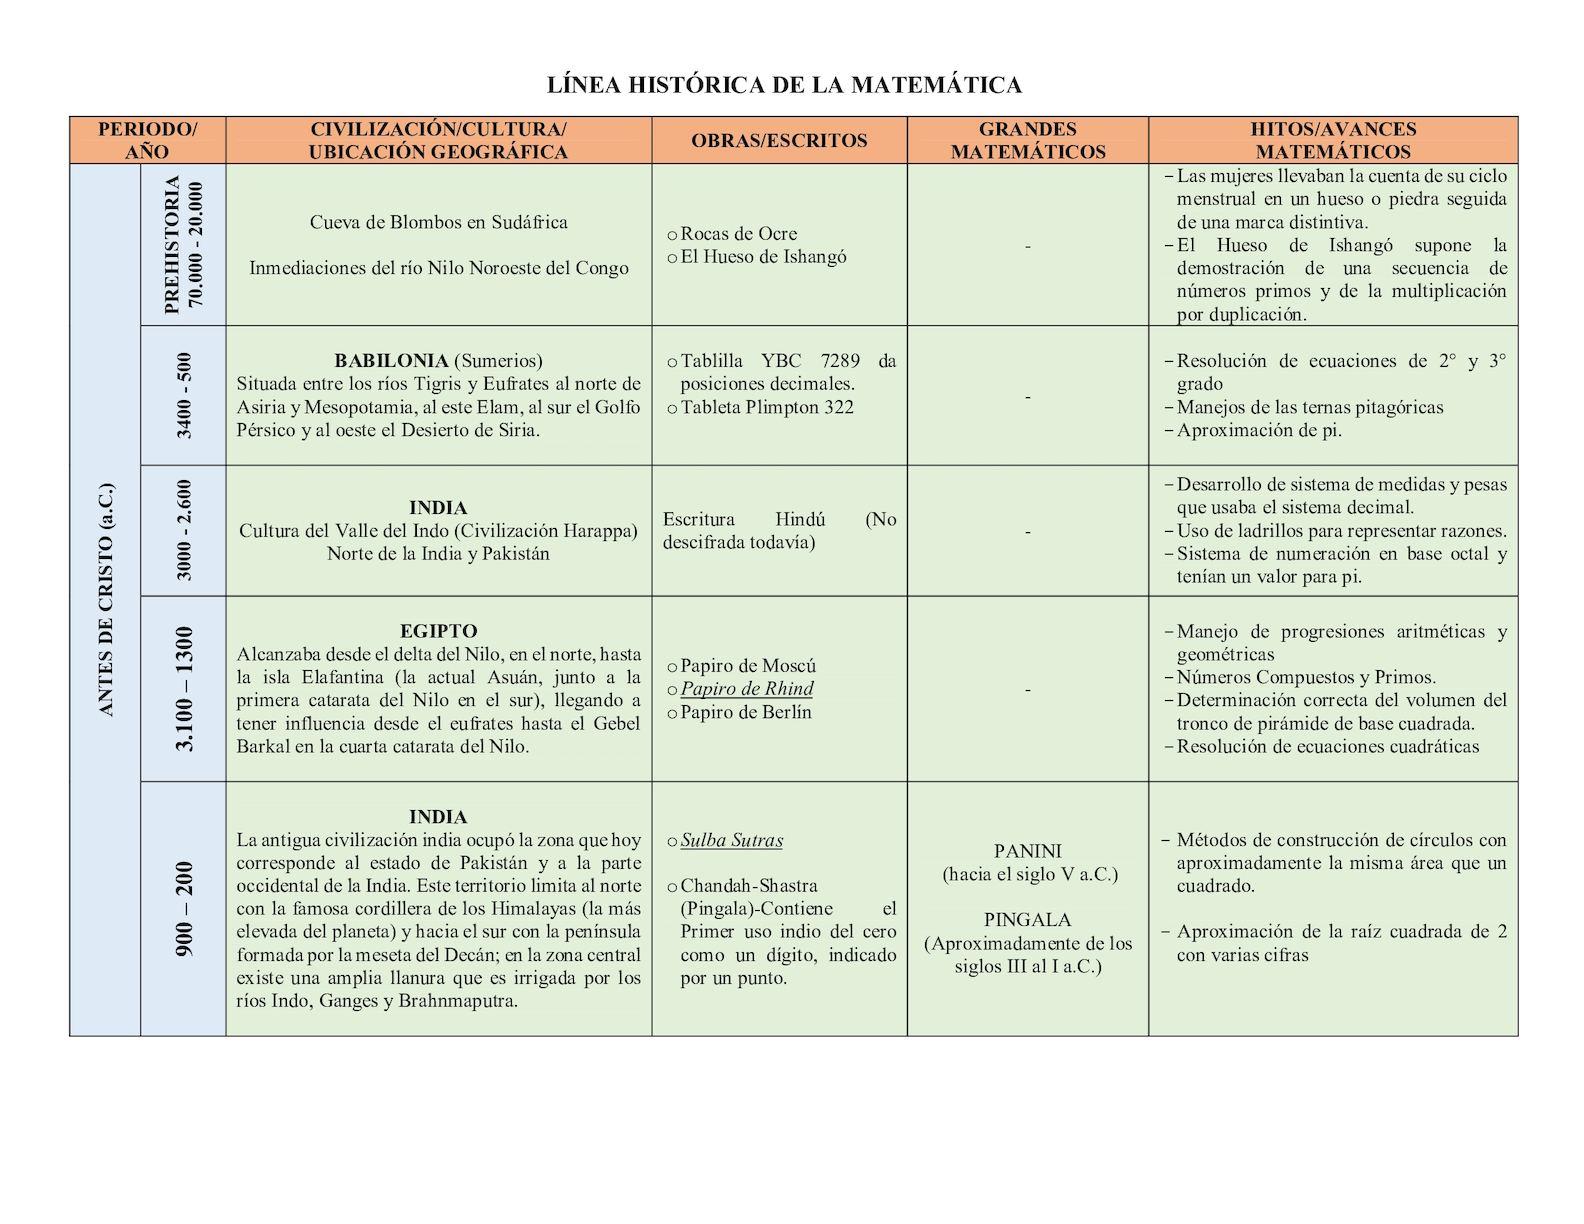 Calameo Linea Historica De La Matematica